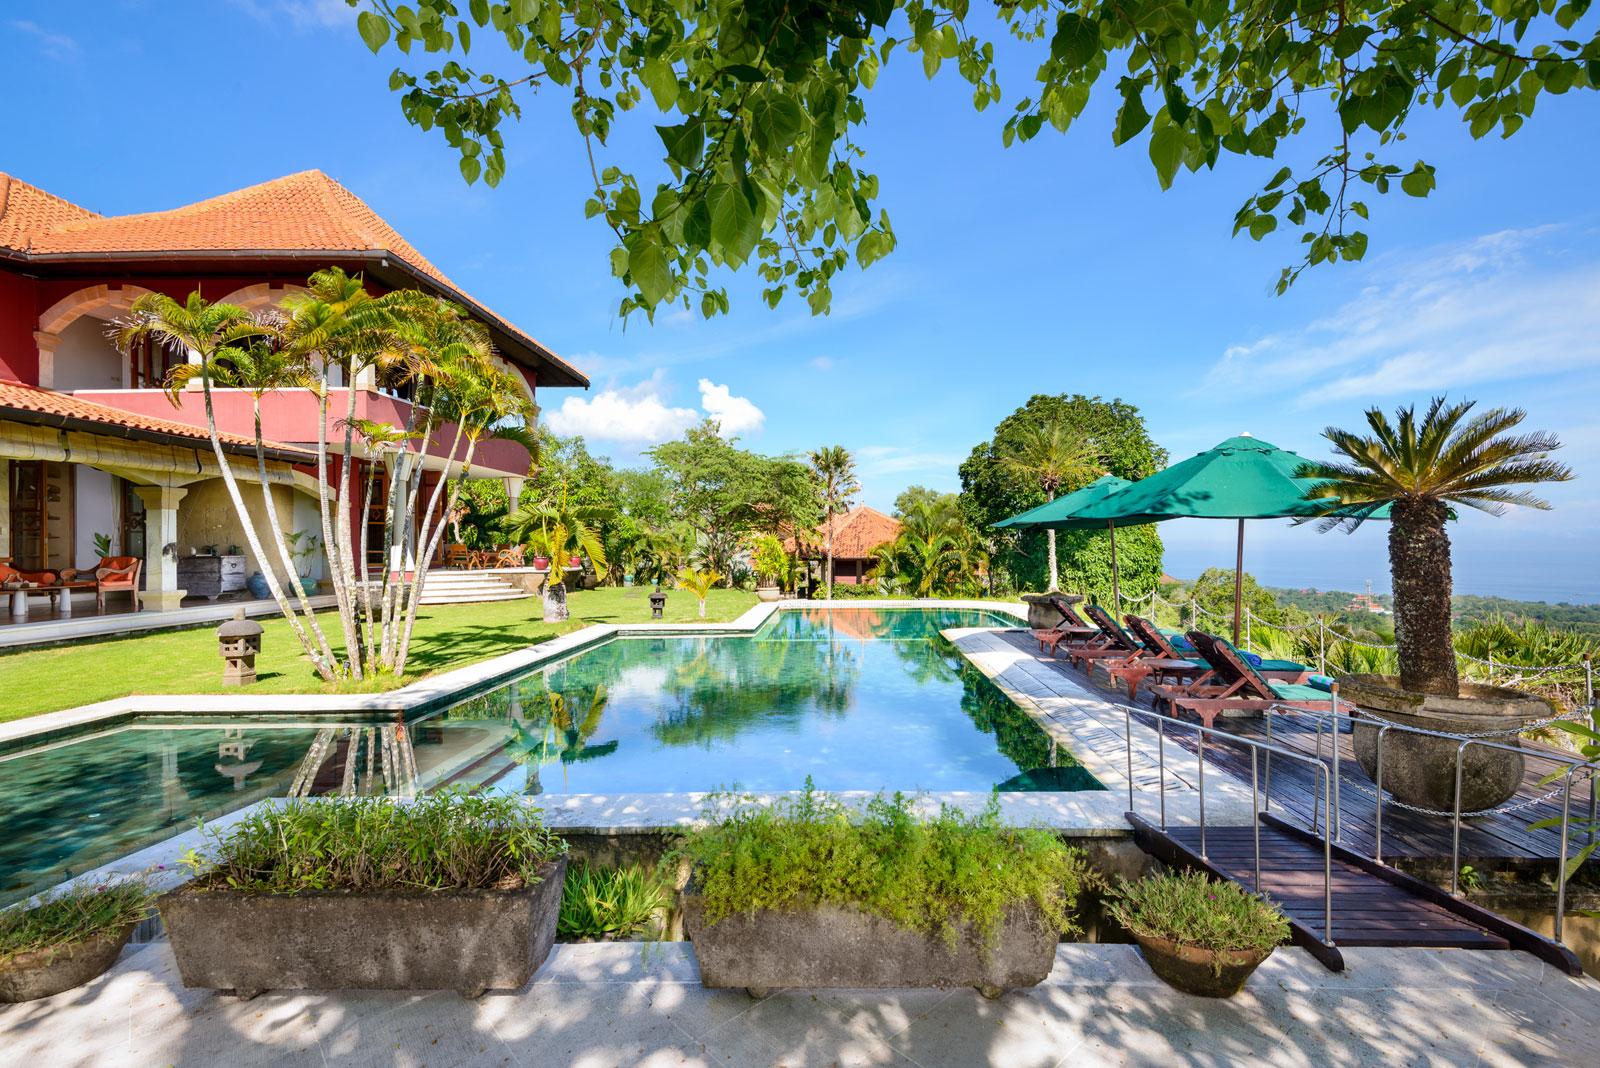 Uluwatu Villas Canang Sari Villas Bali Uluwatu Villas Accommodation For Your Bali Holiday